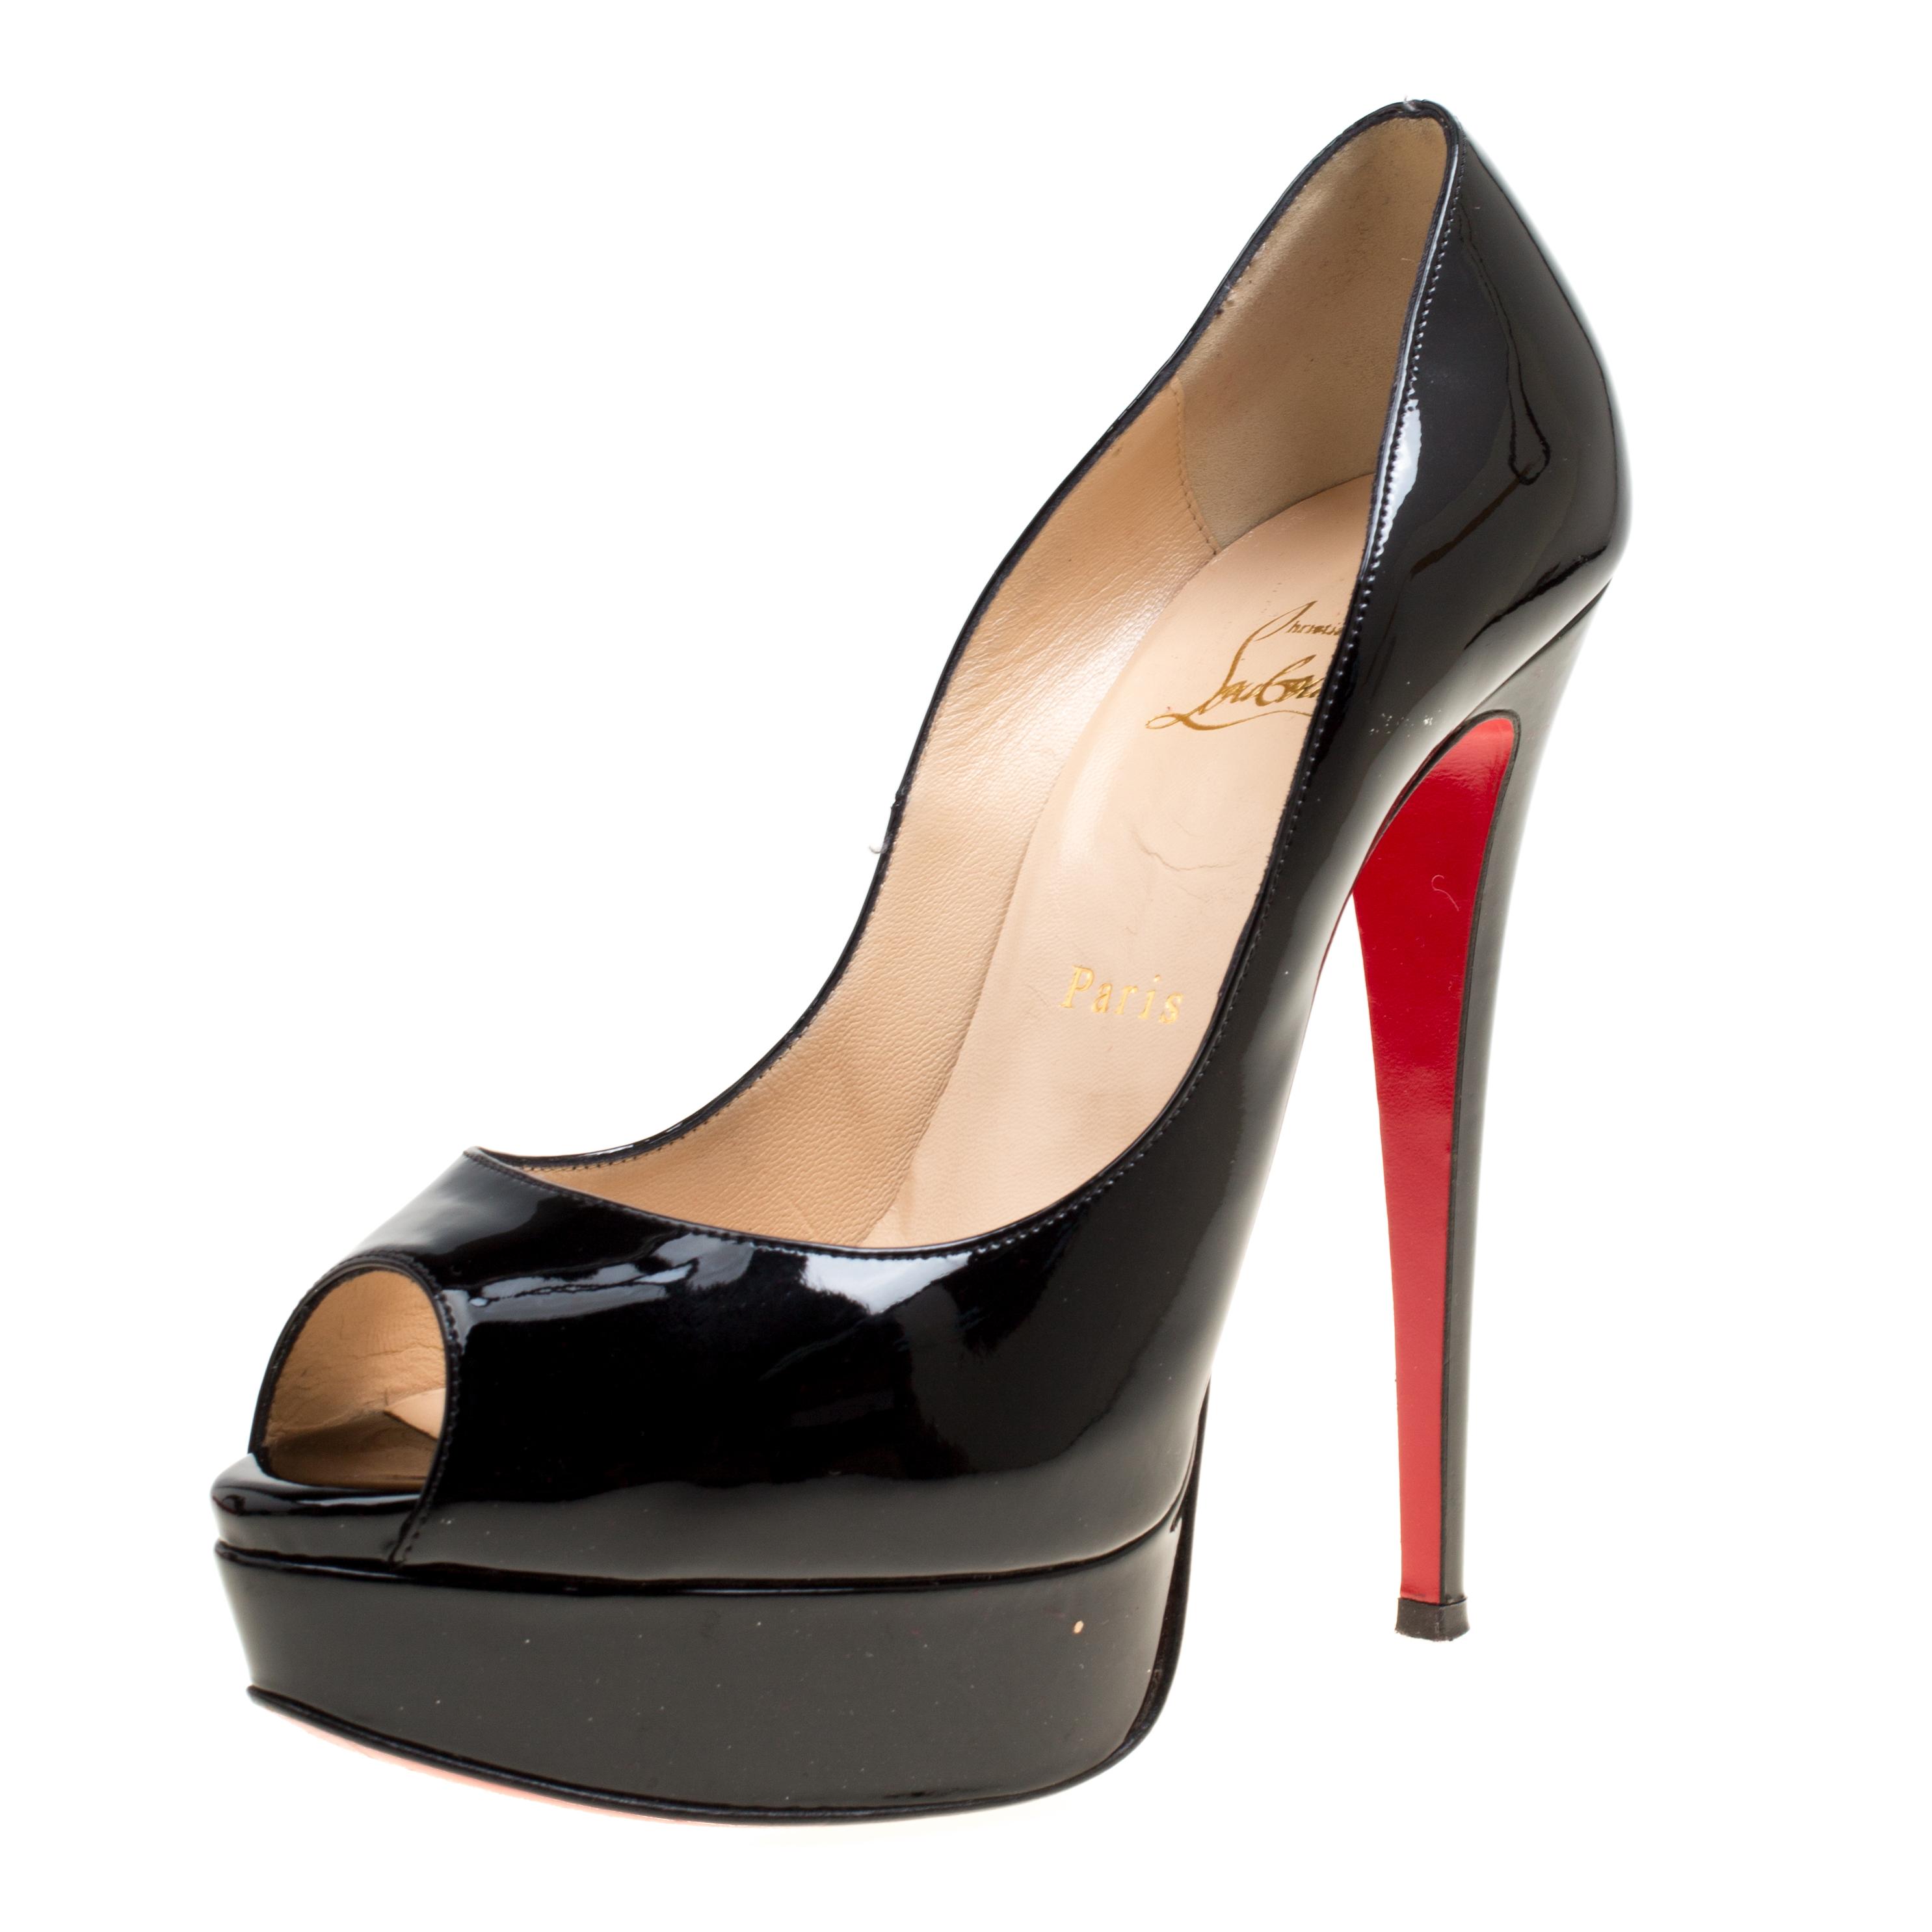 Christian Louboutin Black Patent Leather New Very Prive Peep Toe Platform Pumps Size 38